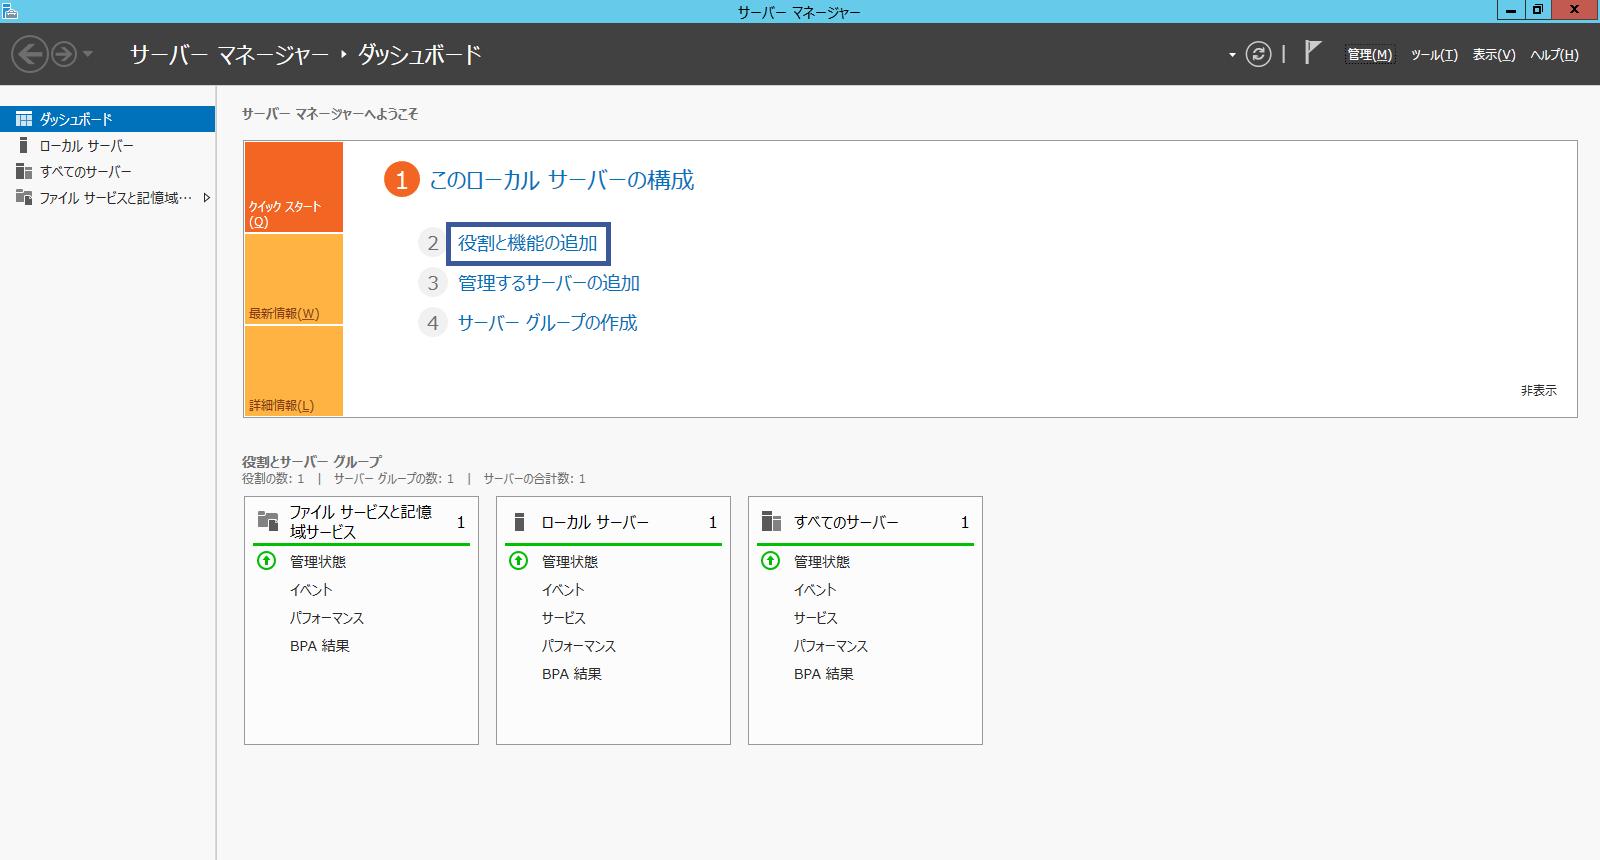 Windows Server 2012 R2 サーバー マネージャー